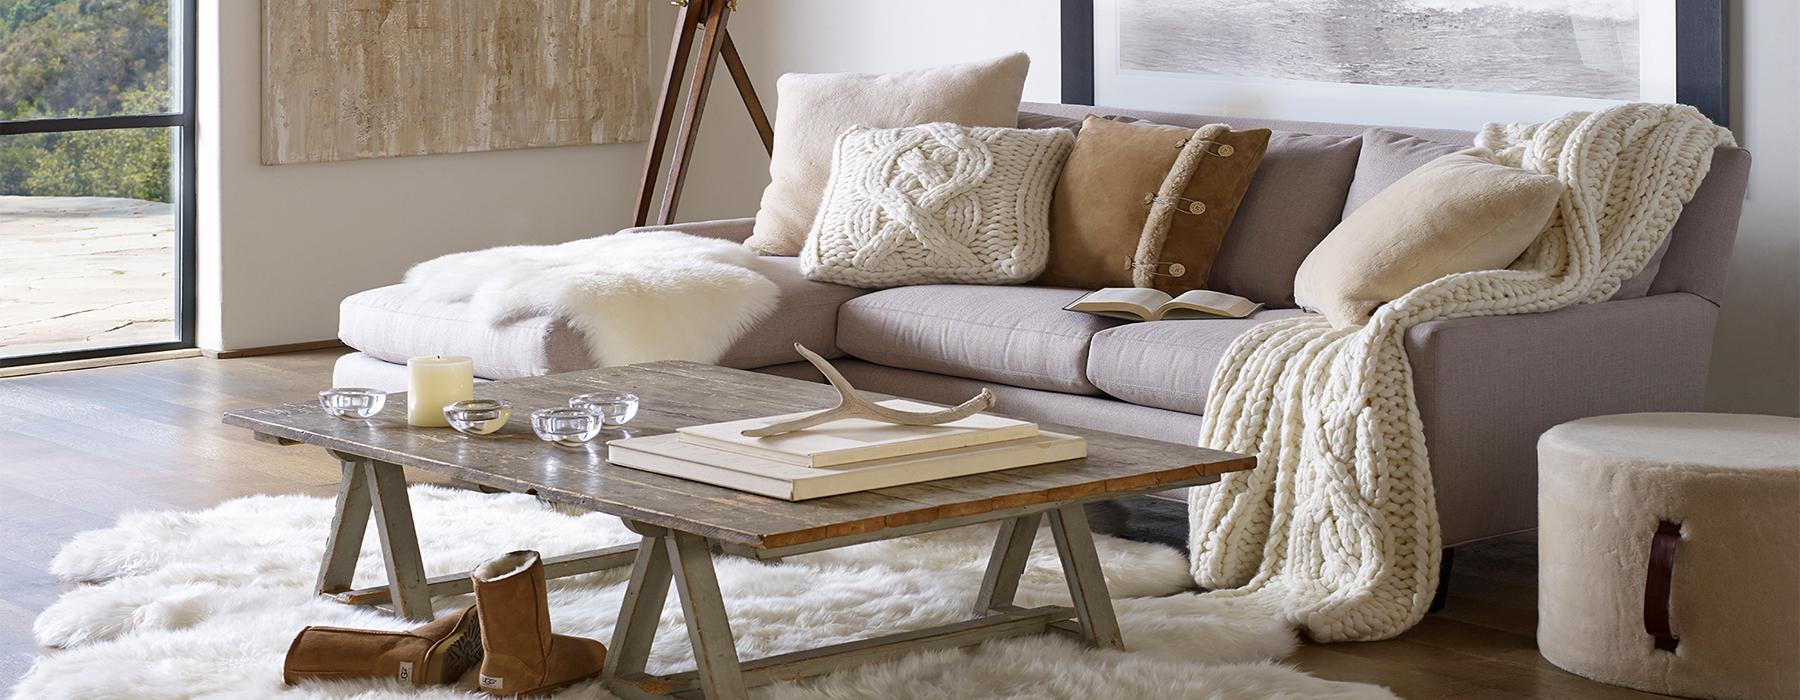 100 Winter Home Decor Images Of Interior Design